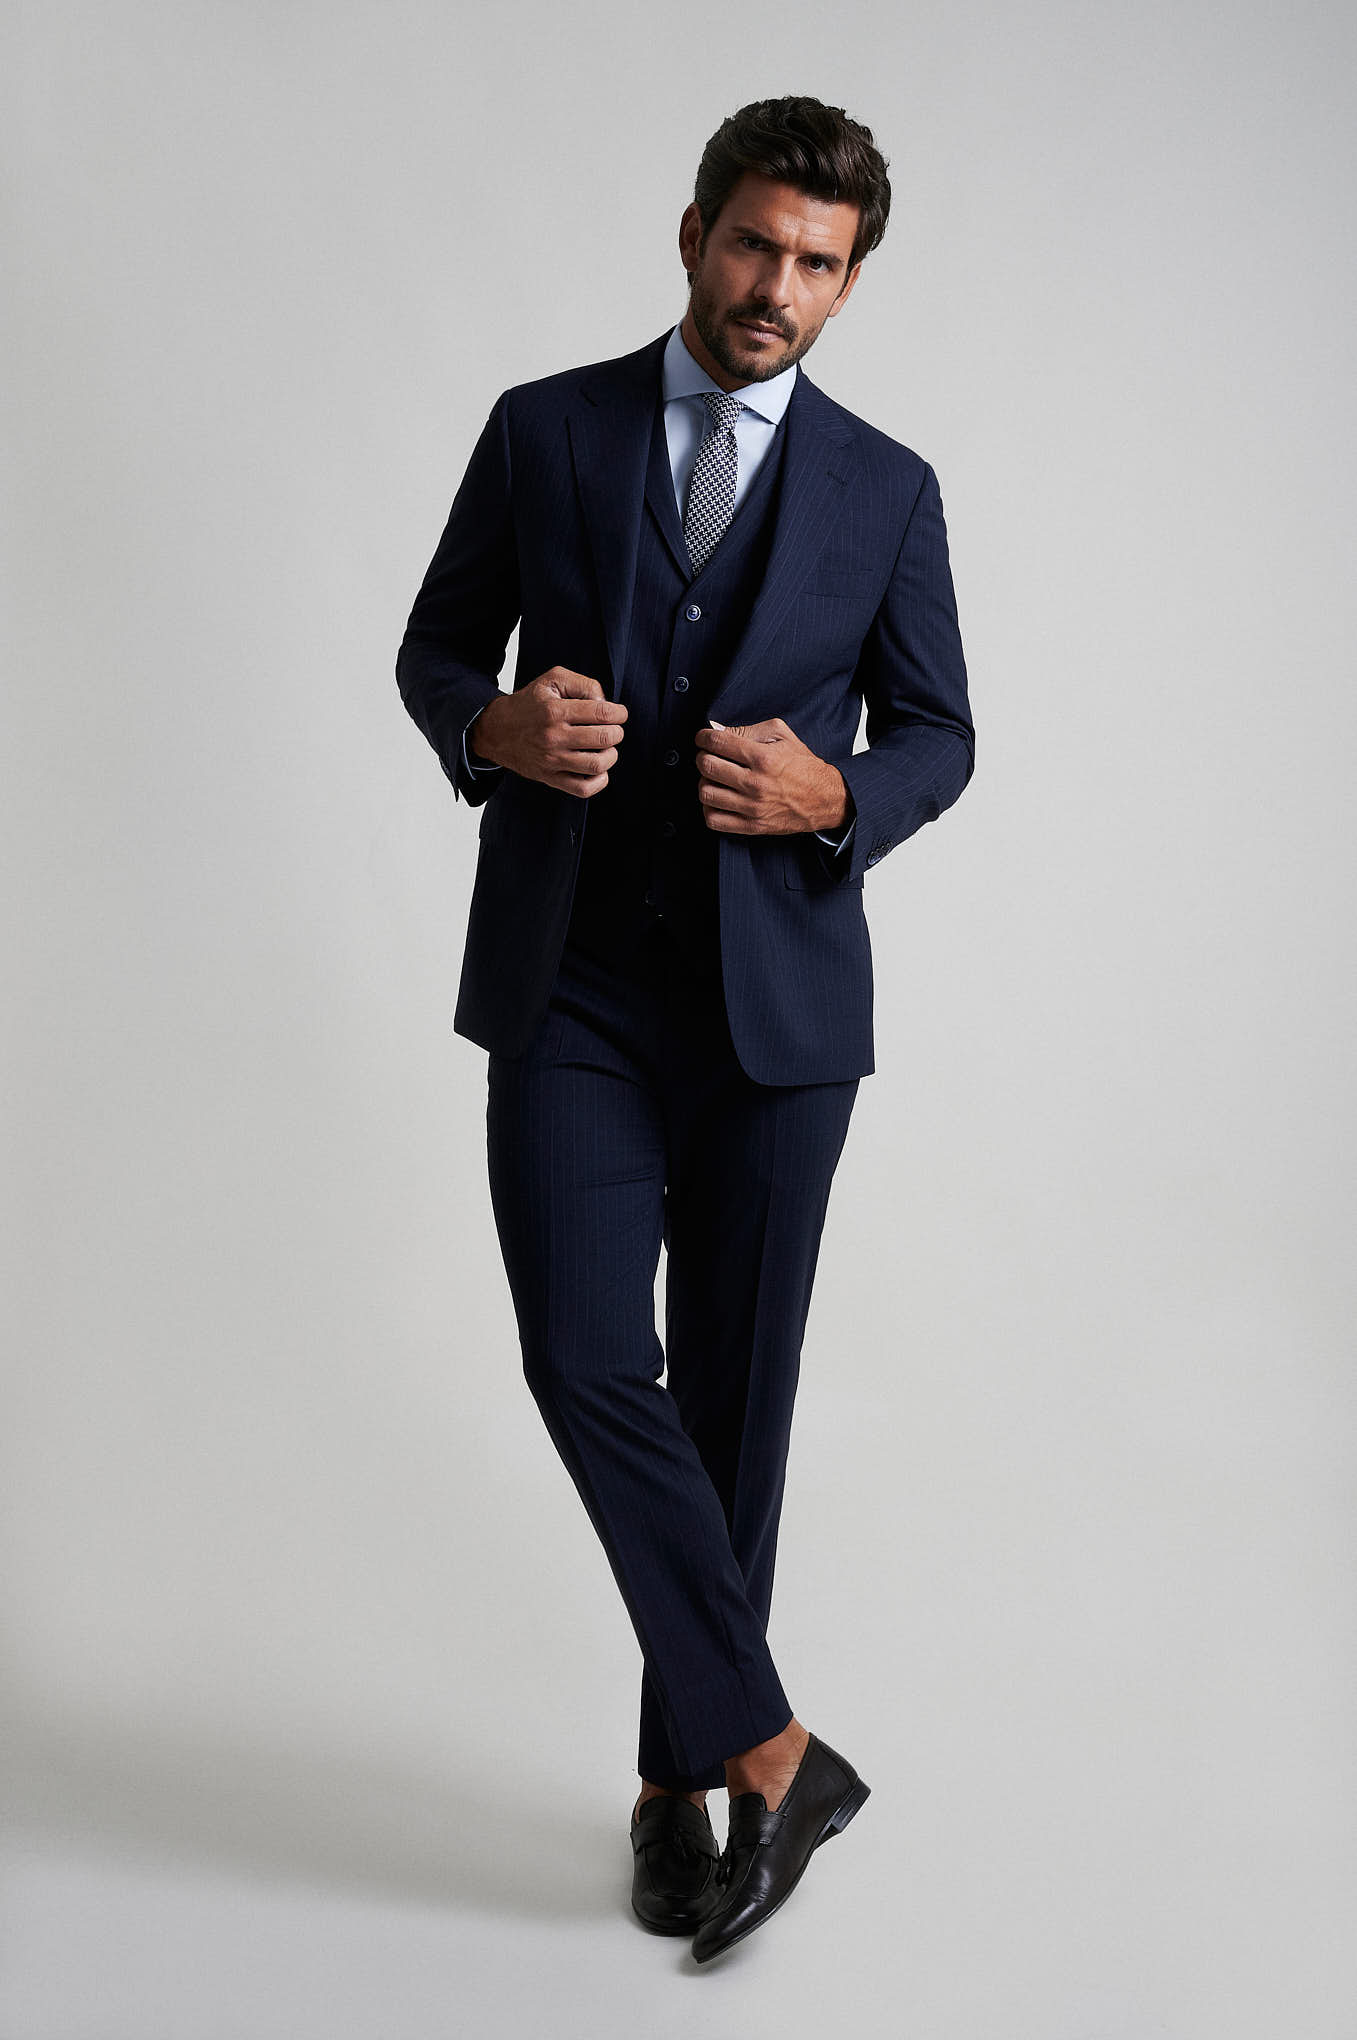 Suit with Vest Dark Blue Formal Man